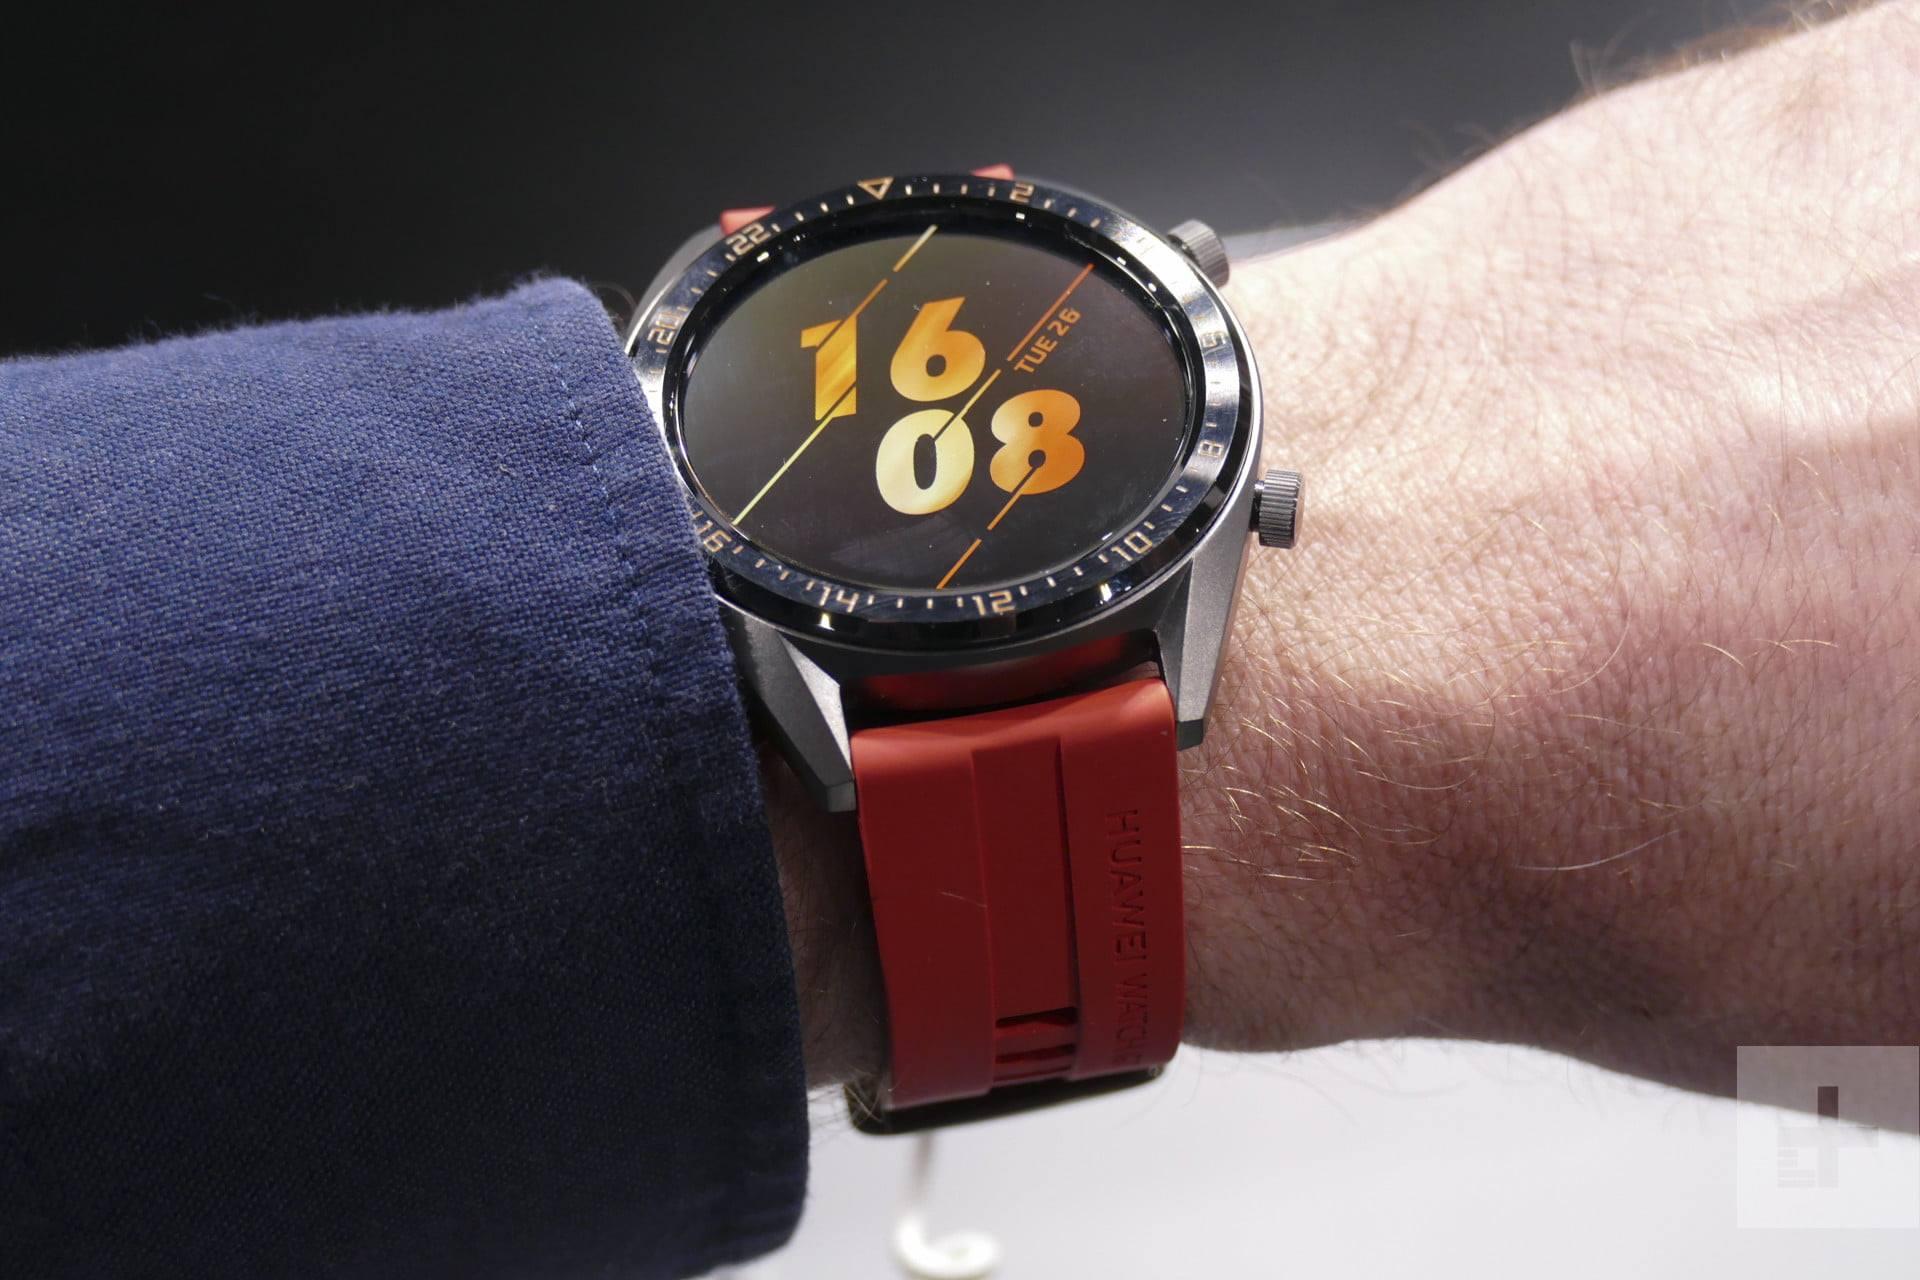 Huawei's HarmonyOS launching Smartwatches & Laptops Outside Of China